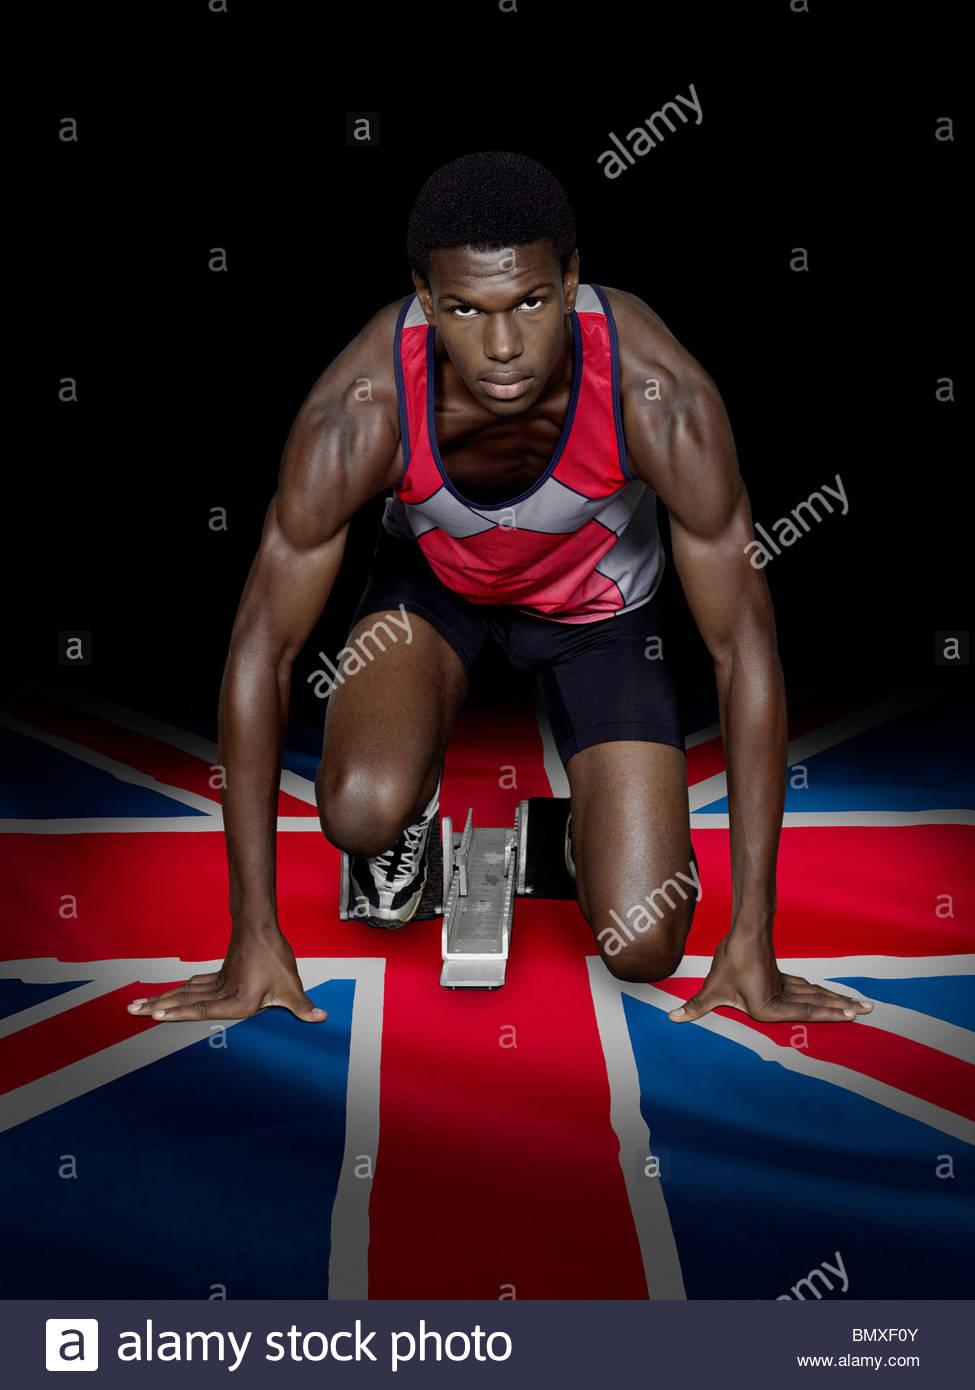 Athlete with british flag - Stock Image